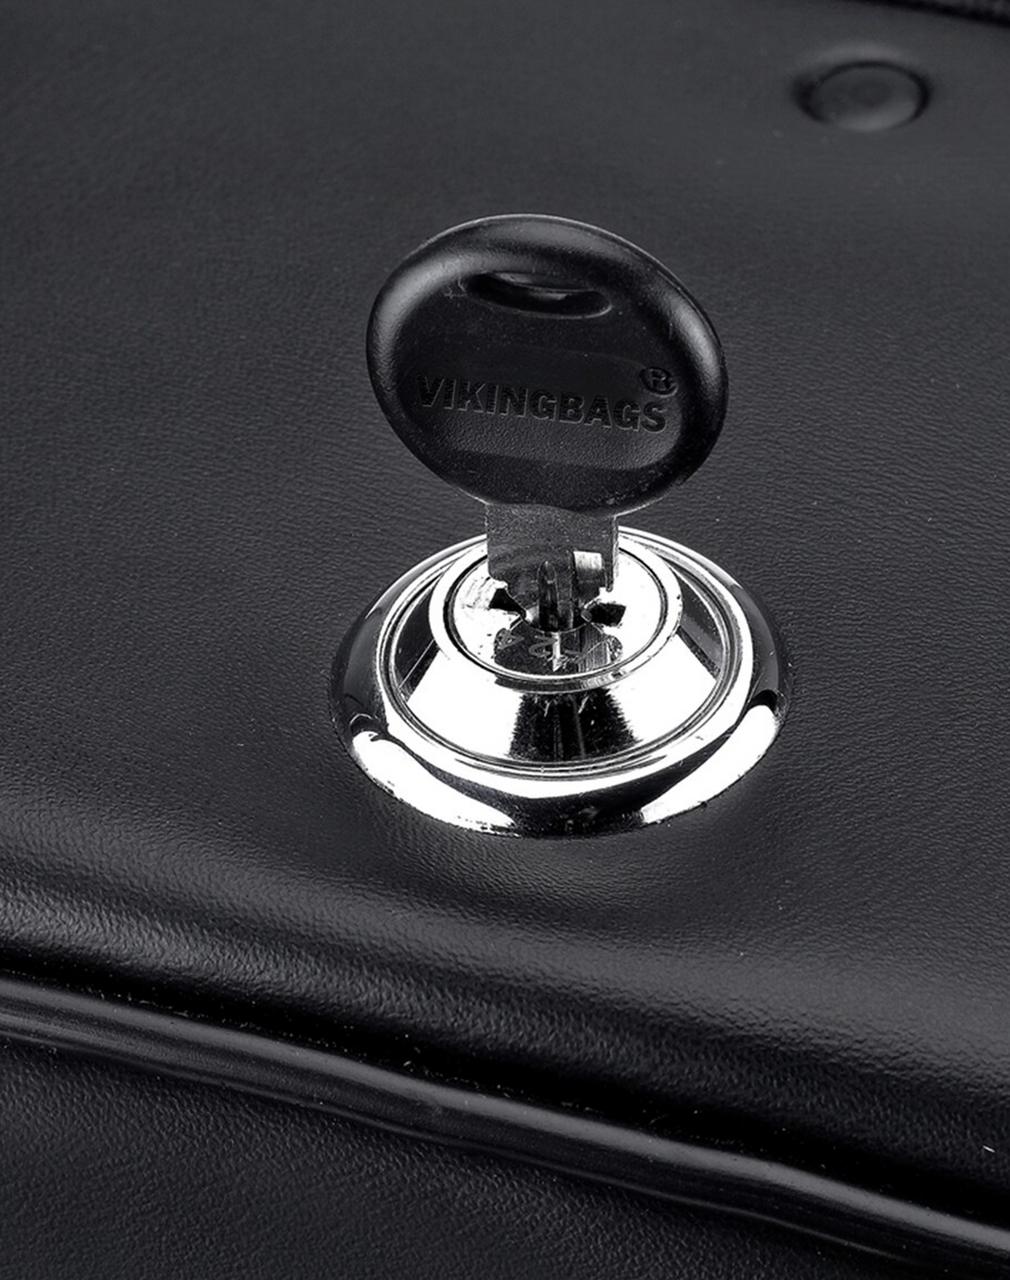 Honda Magna 750 Charger Single Strap Large Motorcycle Saddlebags lock key view